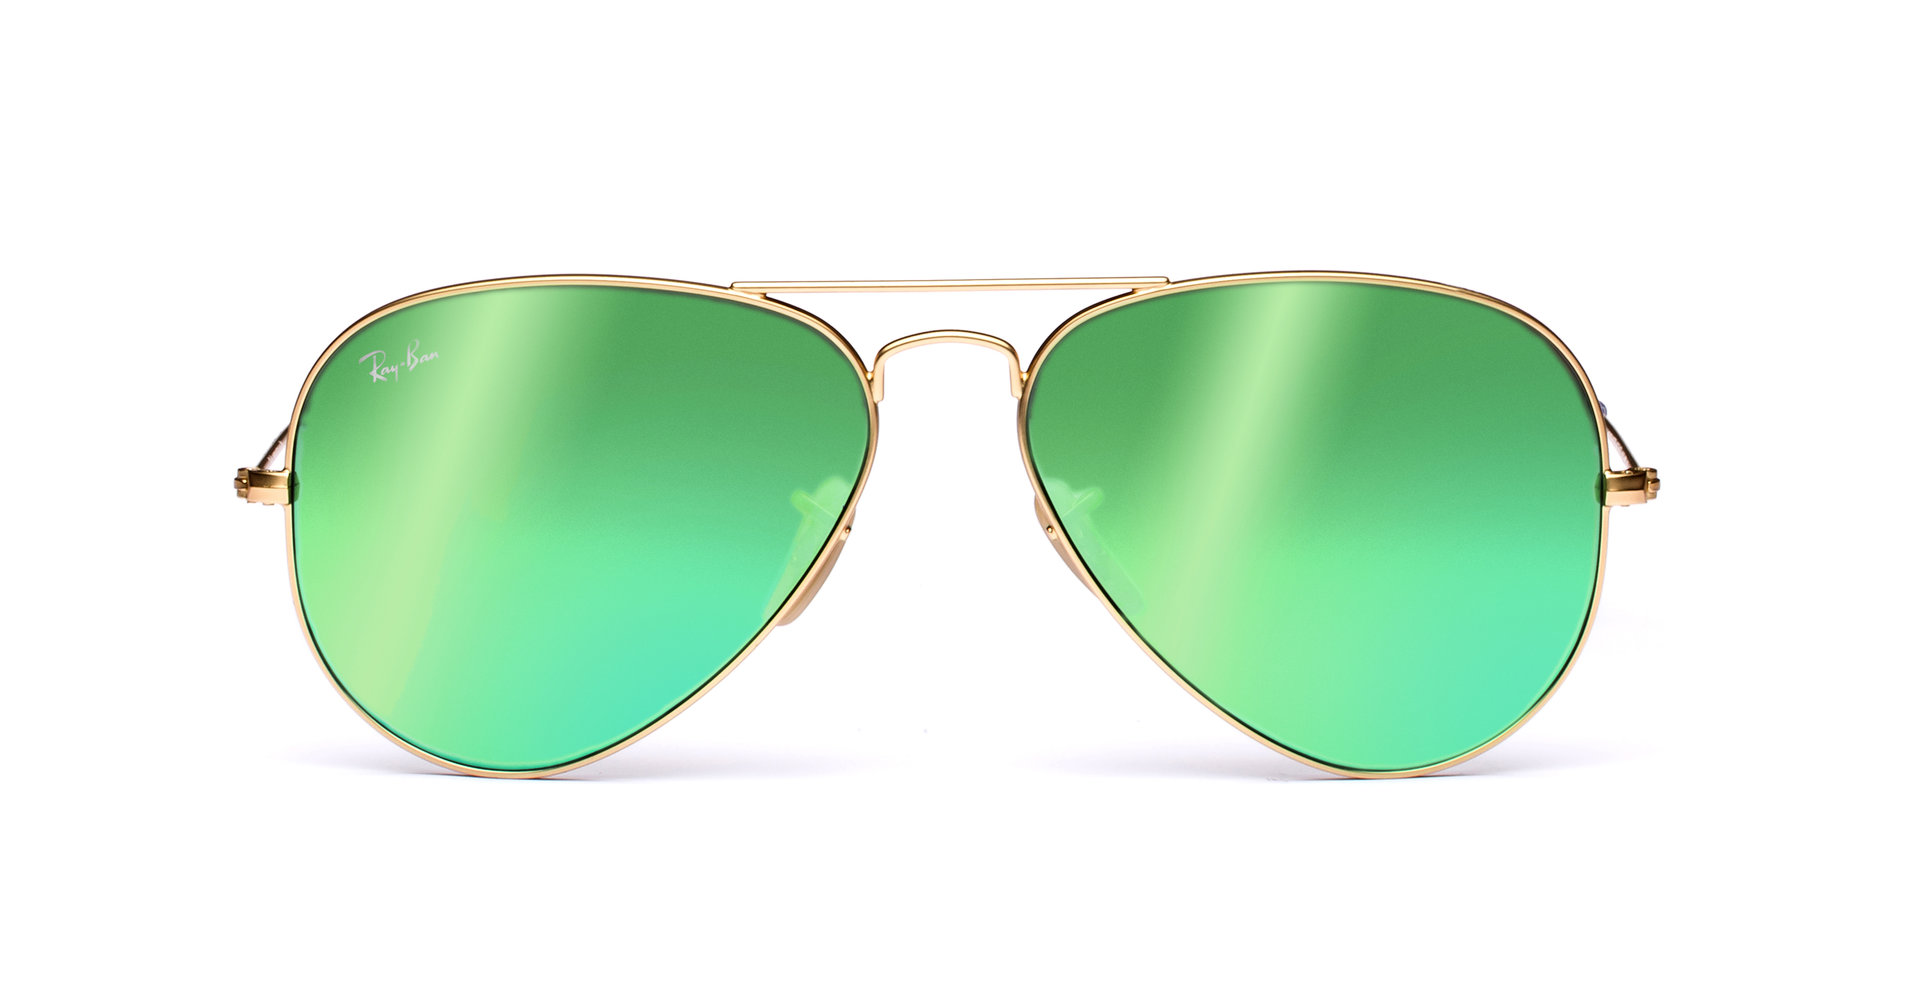 870a6b708 Optique okuliare - Slnečné okuliare Aviator - Ray-Ban Aviator RB 3025 112/19